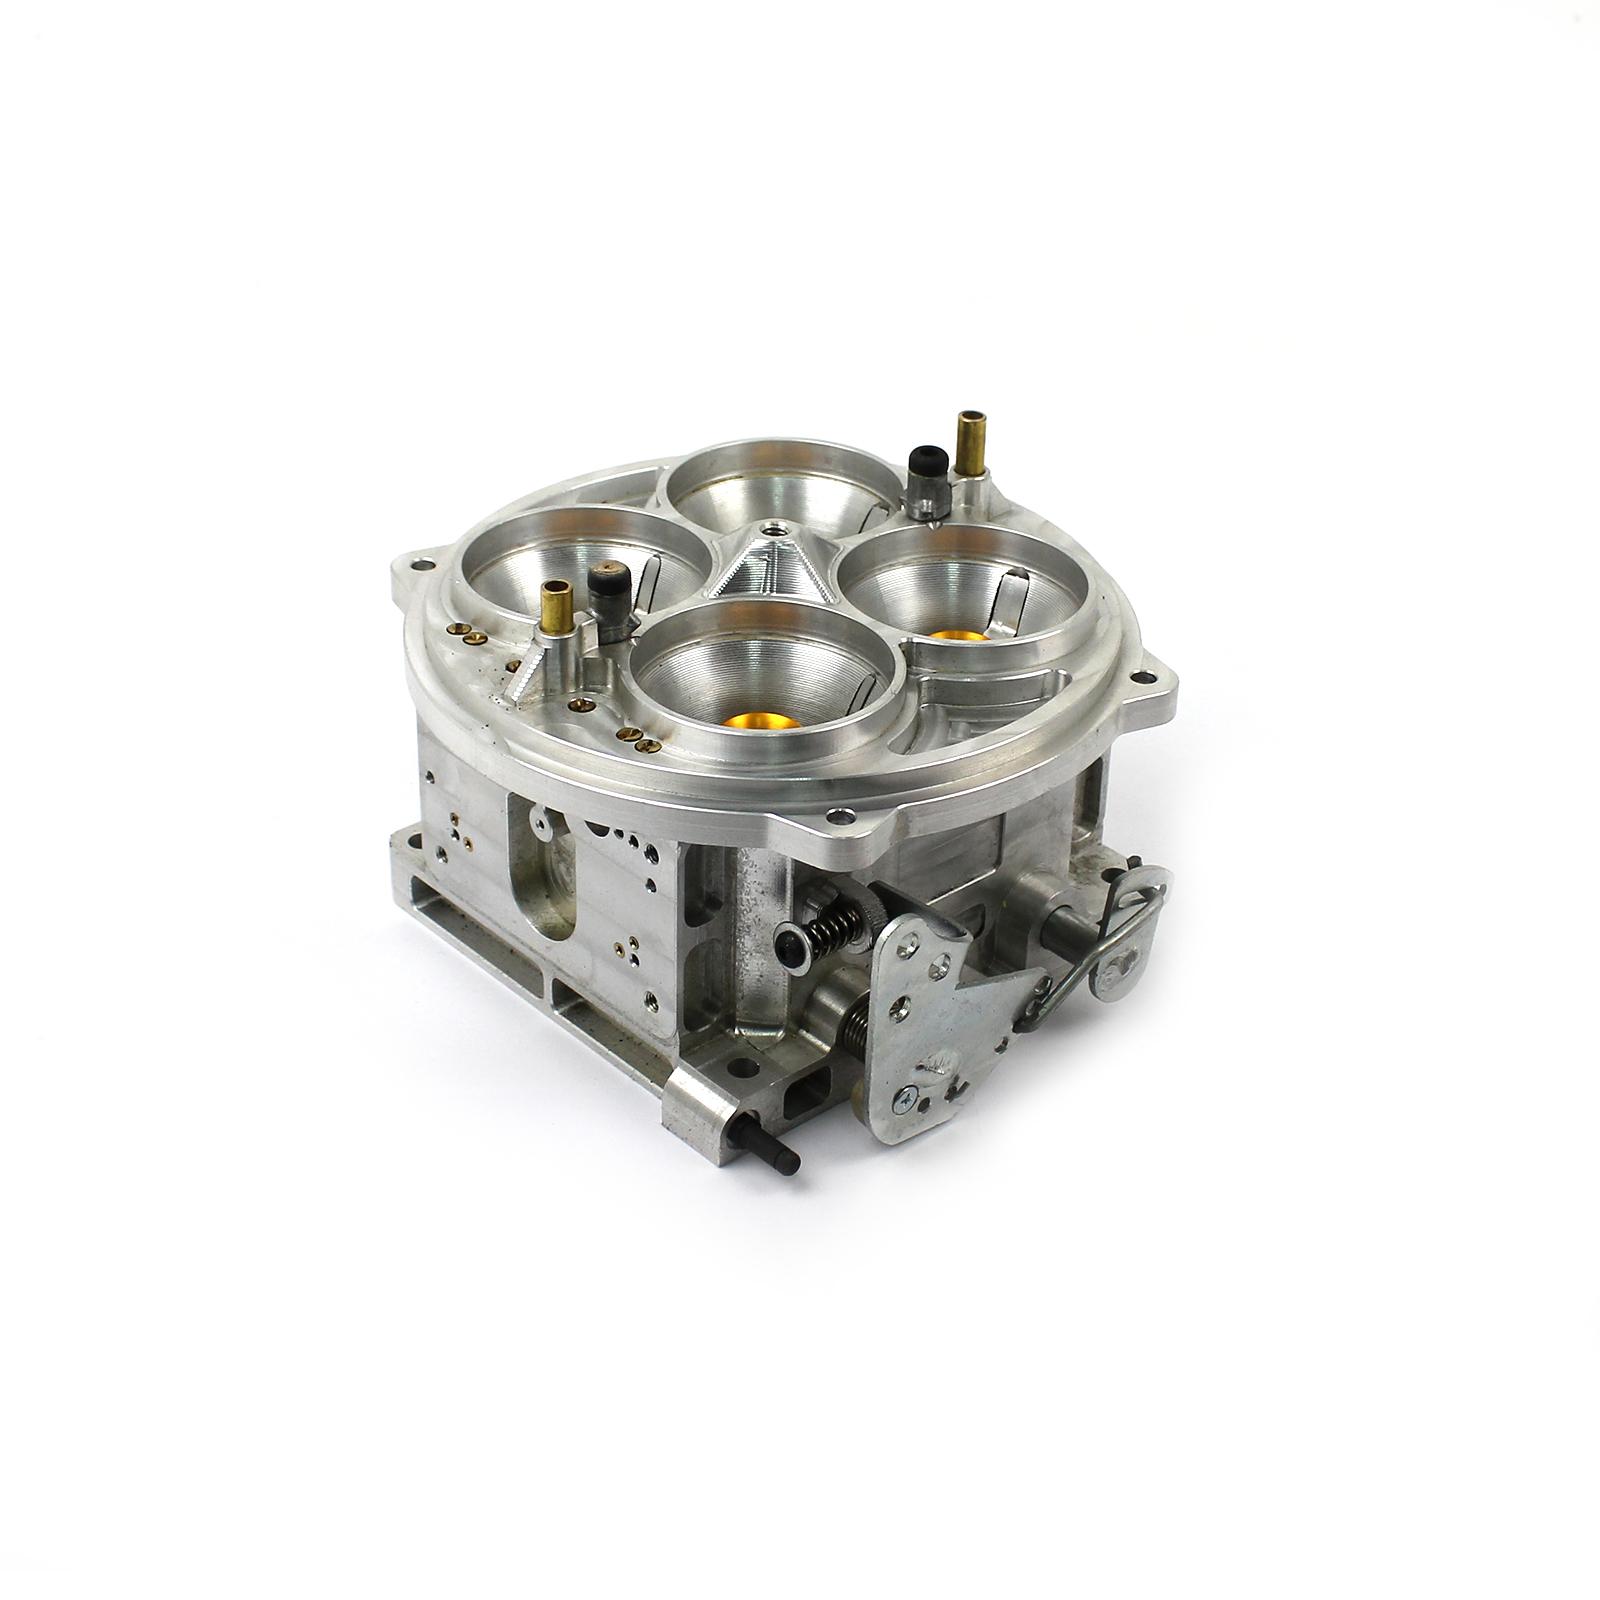 Billet Alum 4 Barrel Carburetor Main Body 3 Circuit Suits: Holley 4500 Dominator